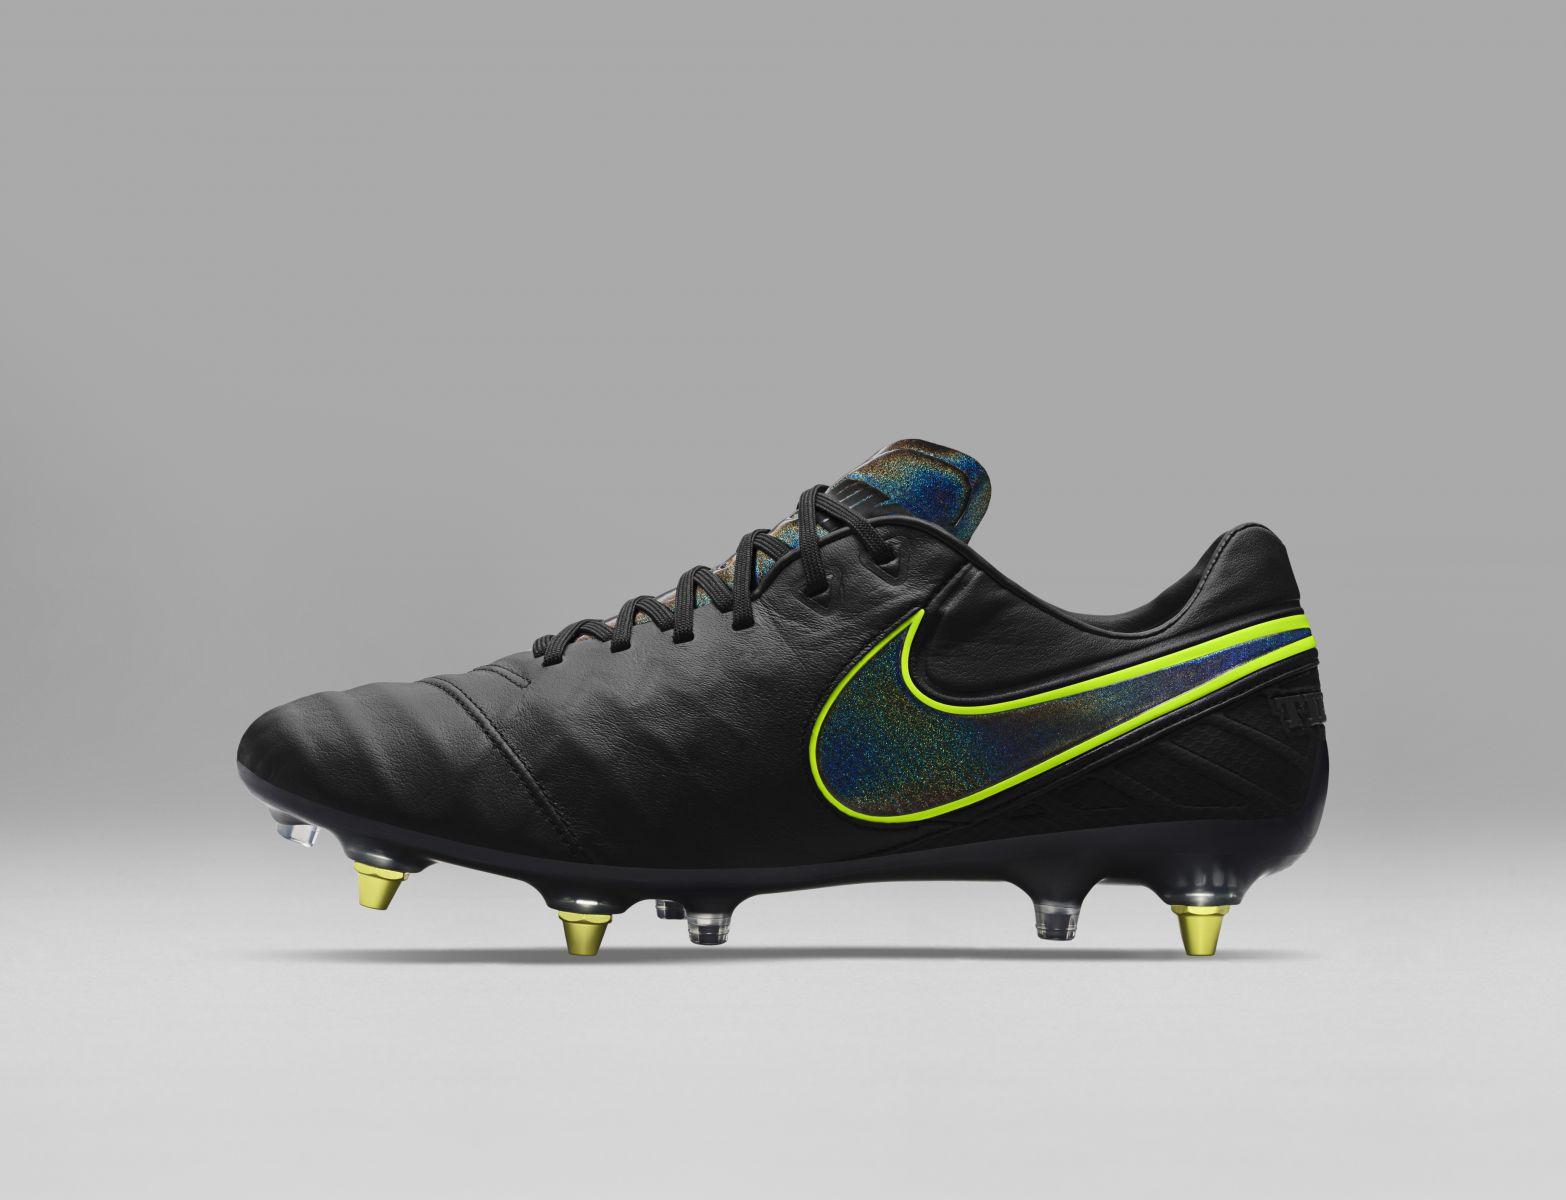 кроссовки Nike Anti-Clog Traction